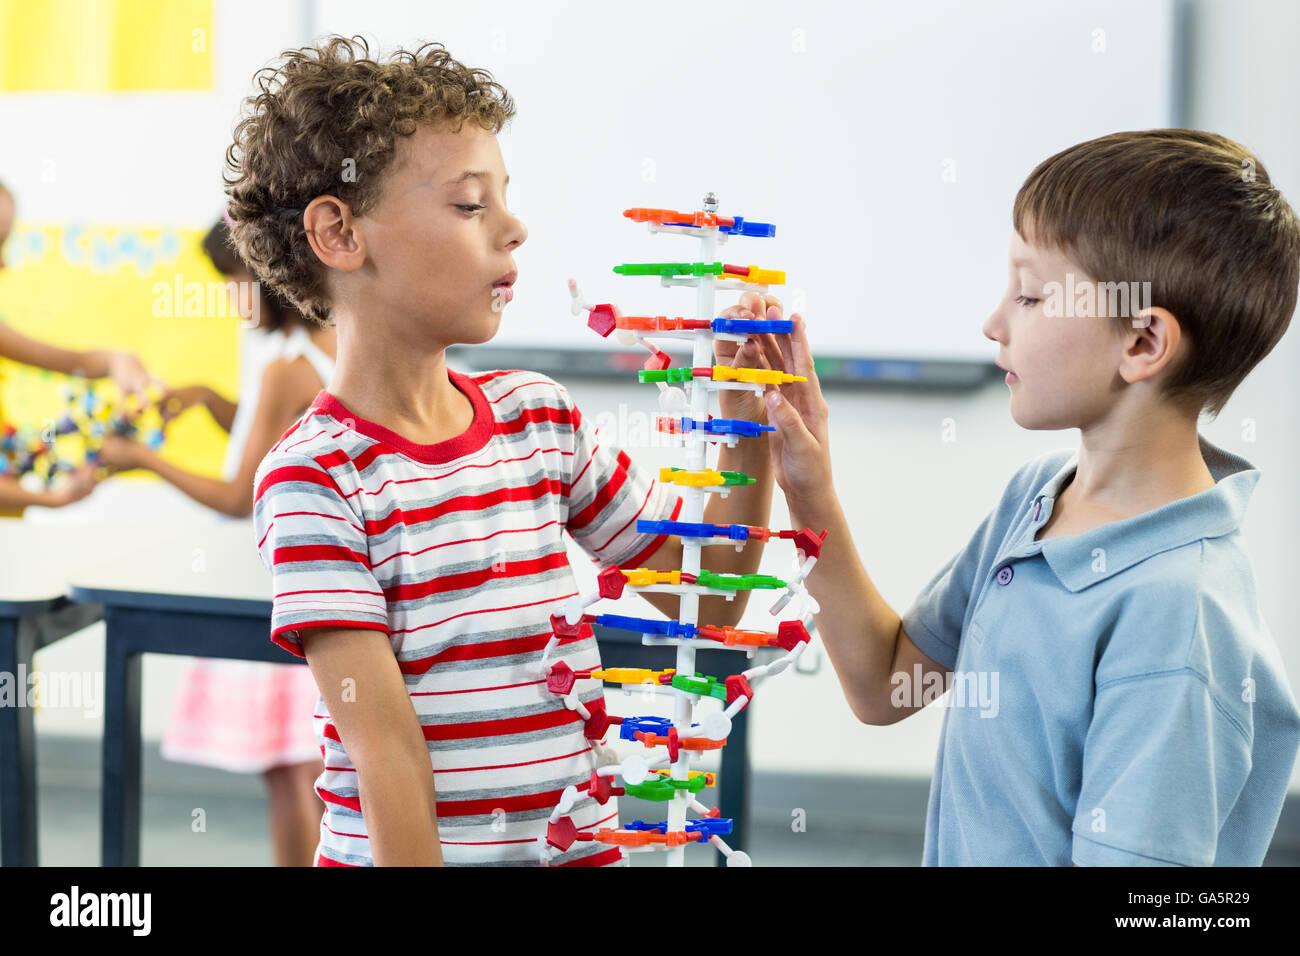 Boys observing at DNA model - Stock Image